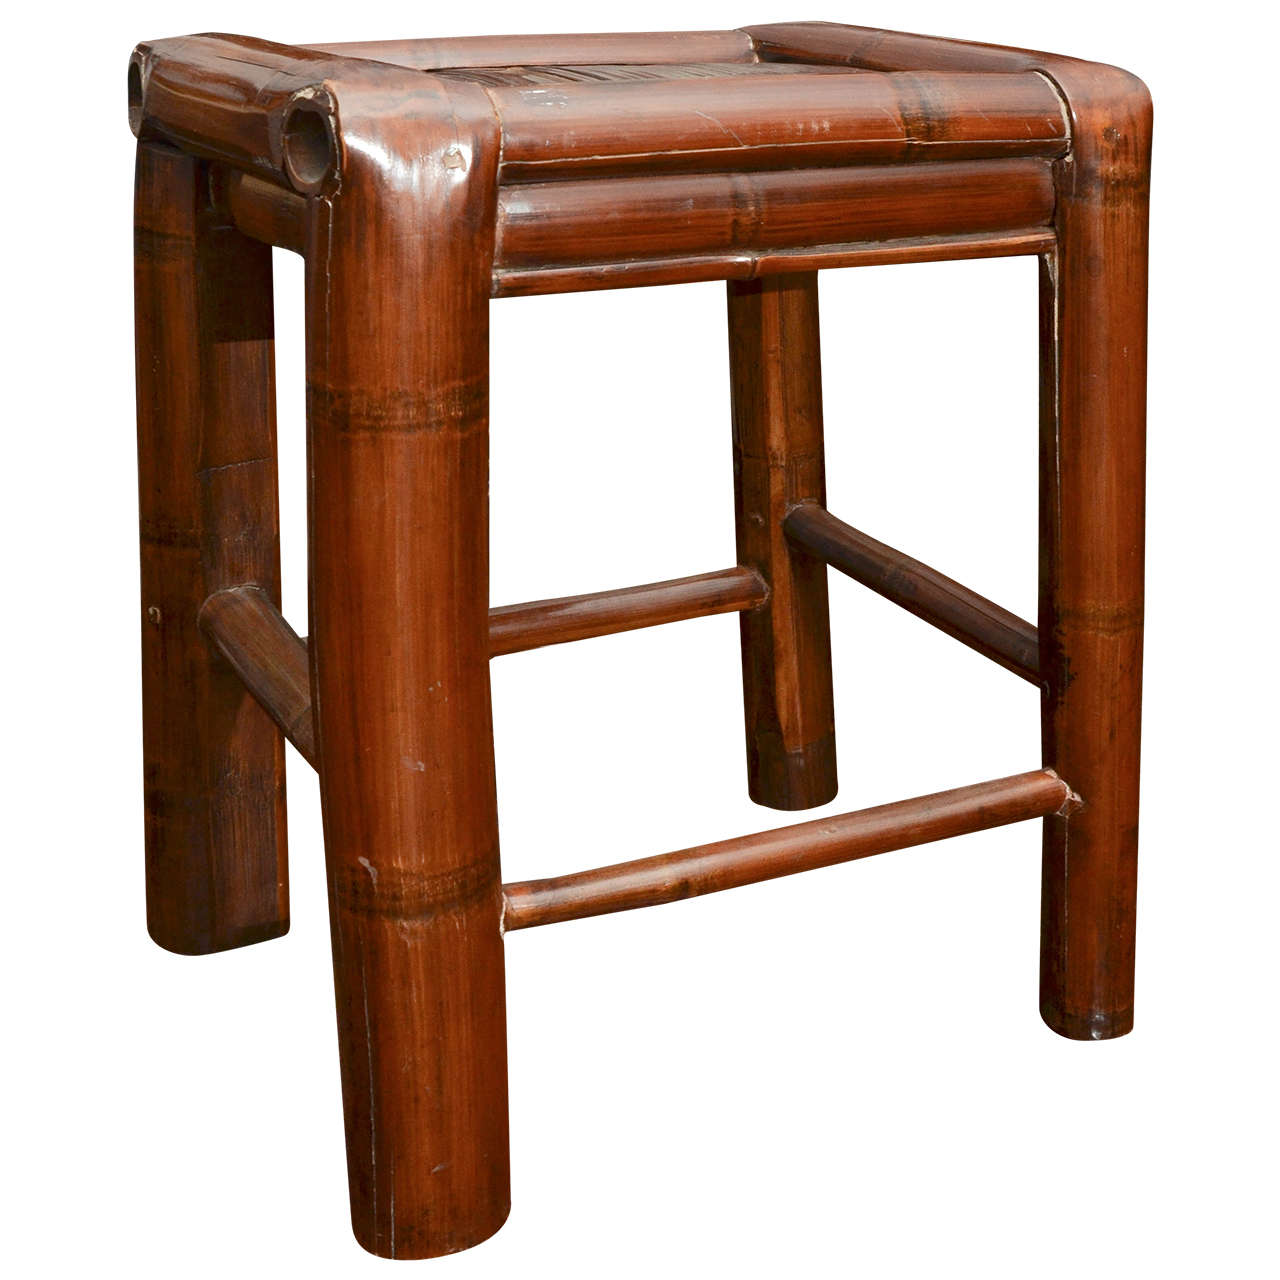 Late 19th Century Qing Dynasty Ningbo Woven Bamboo Stool